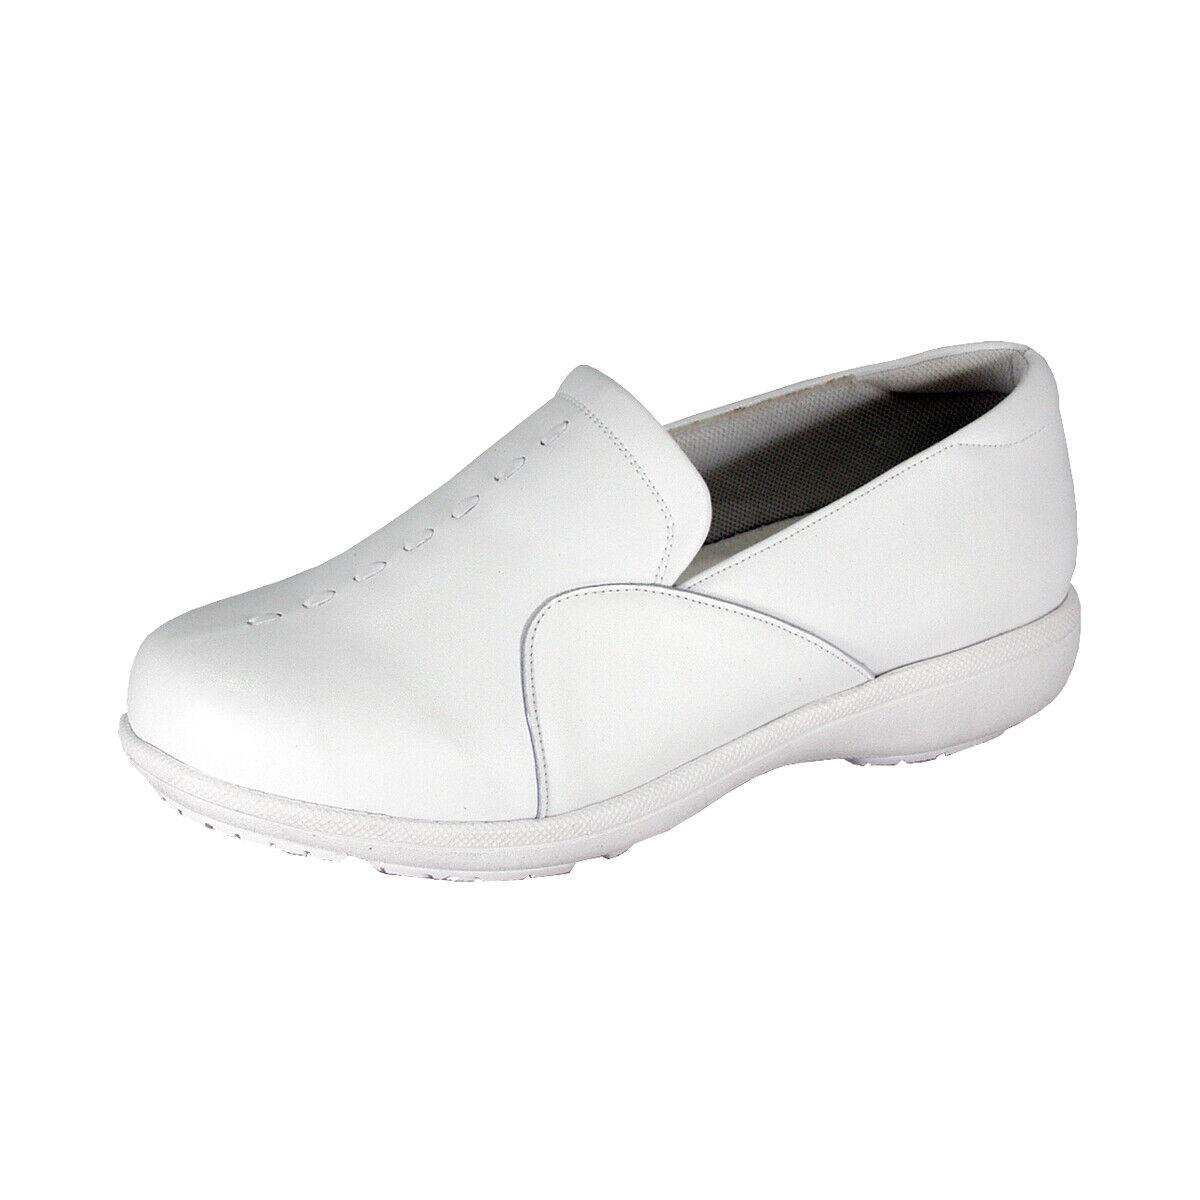 9a5cbd6d63a6 👠 FLORAL Jenna Women Wide Width Glittery Rhinestone Straps Dress Sandals 👠